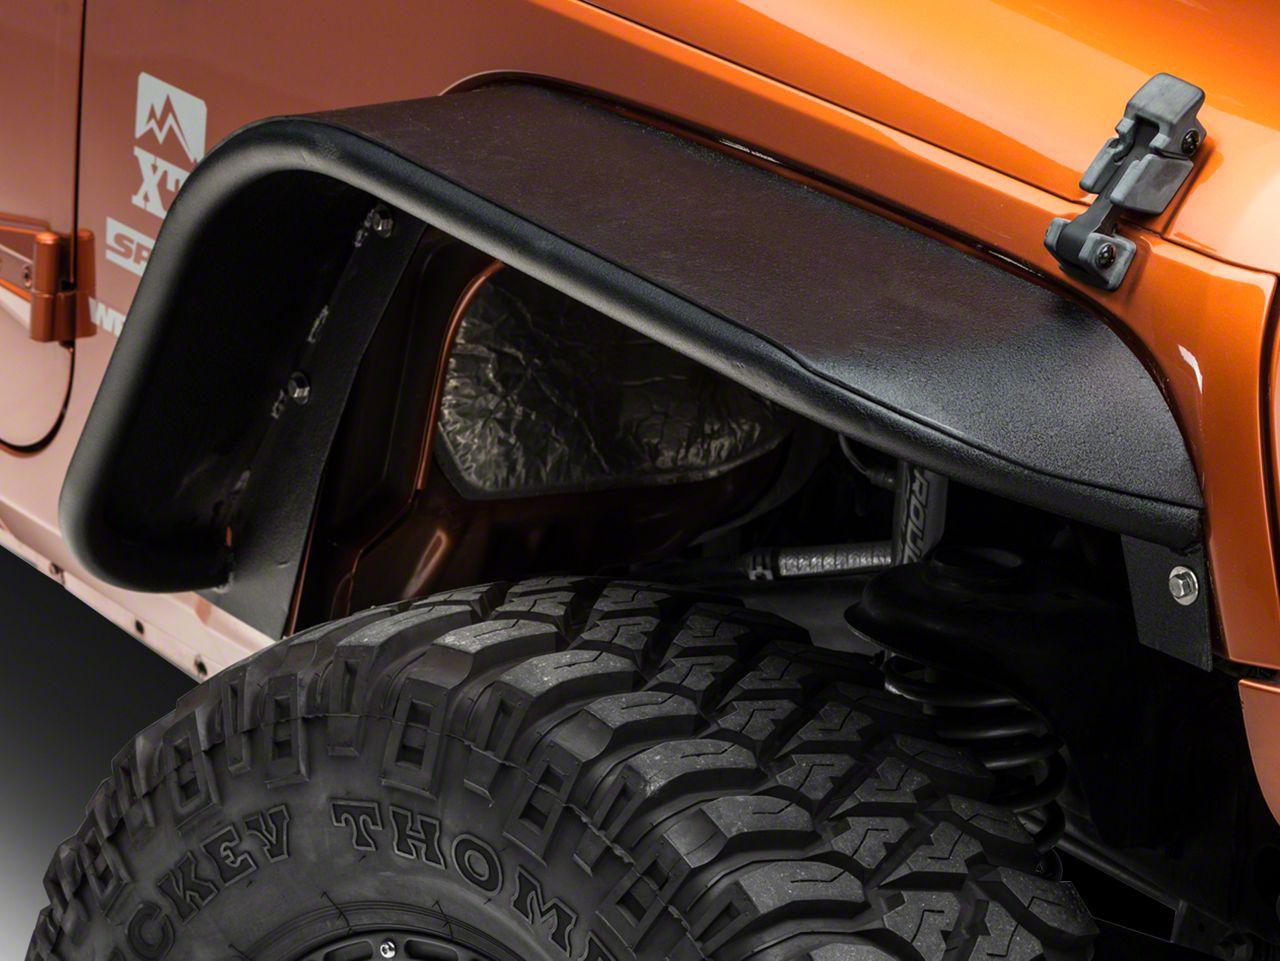 Barricade Rear Tubular Fender Flares (07-18 Jeep Wrangler JK)